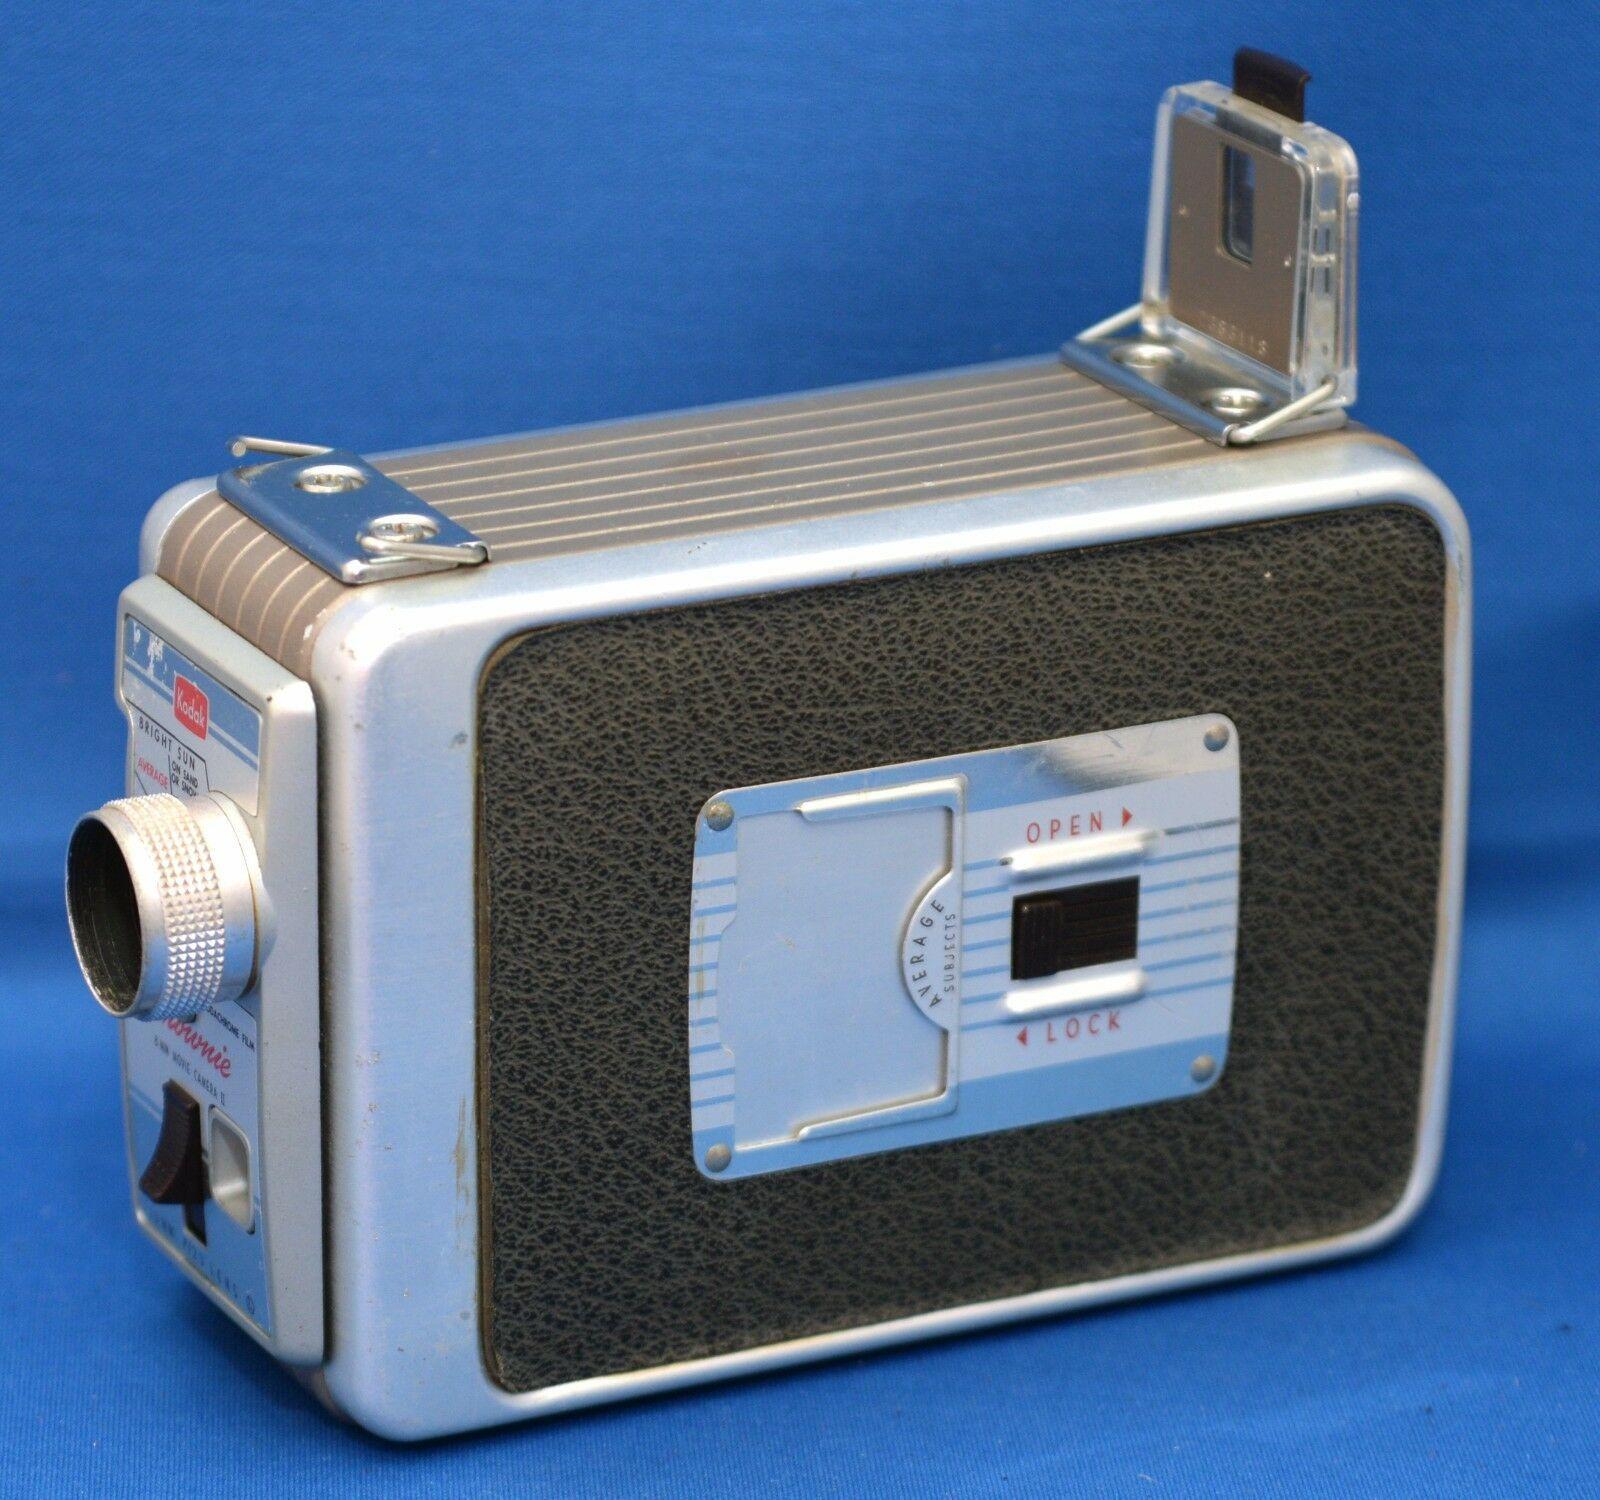 KODAK BROWNIE 8mm Vintage Movie Camera II f/2.3 13mm lens USA